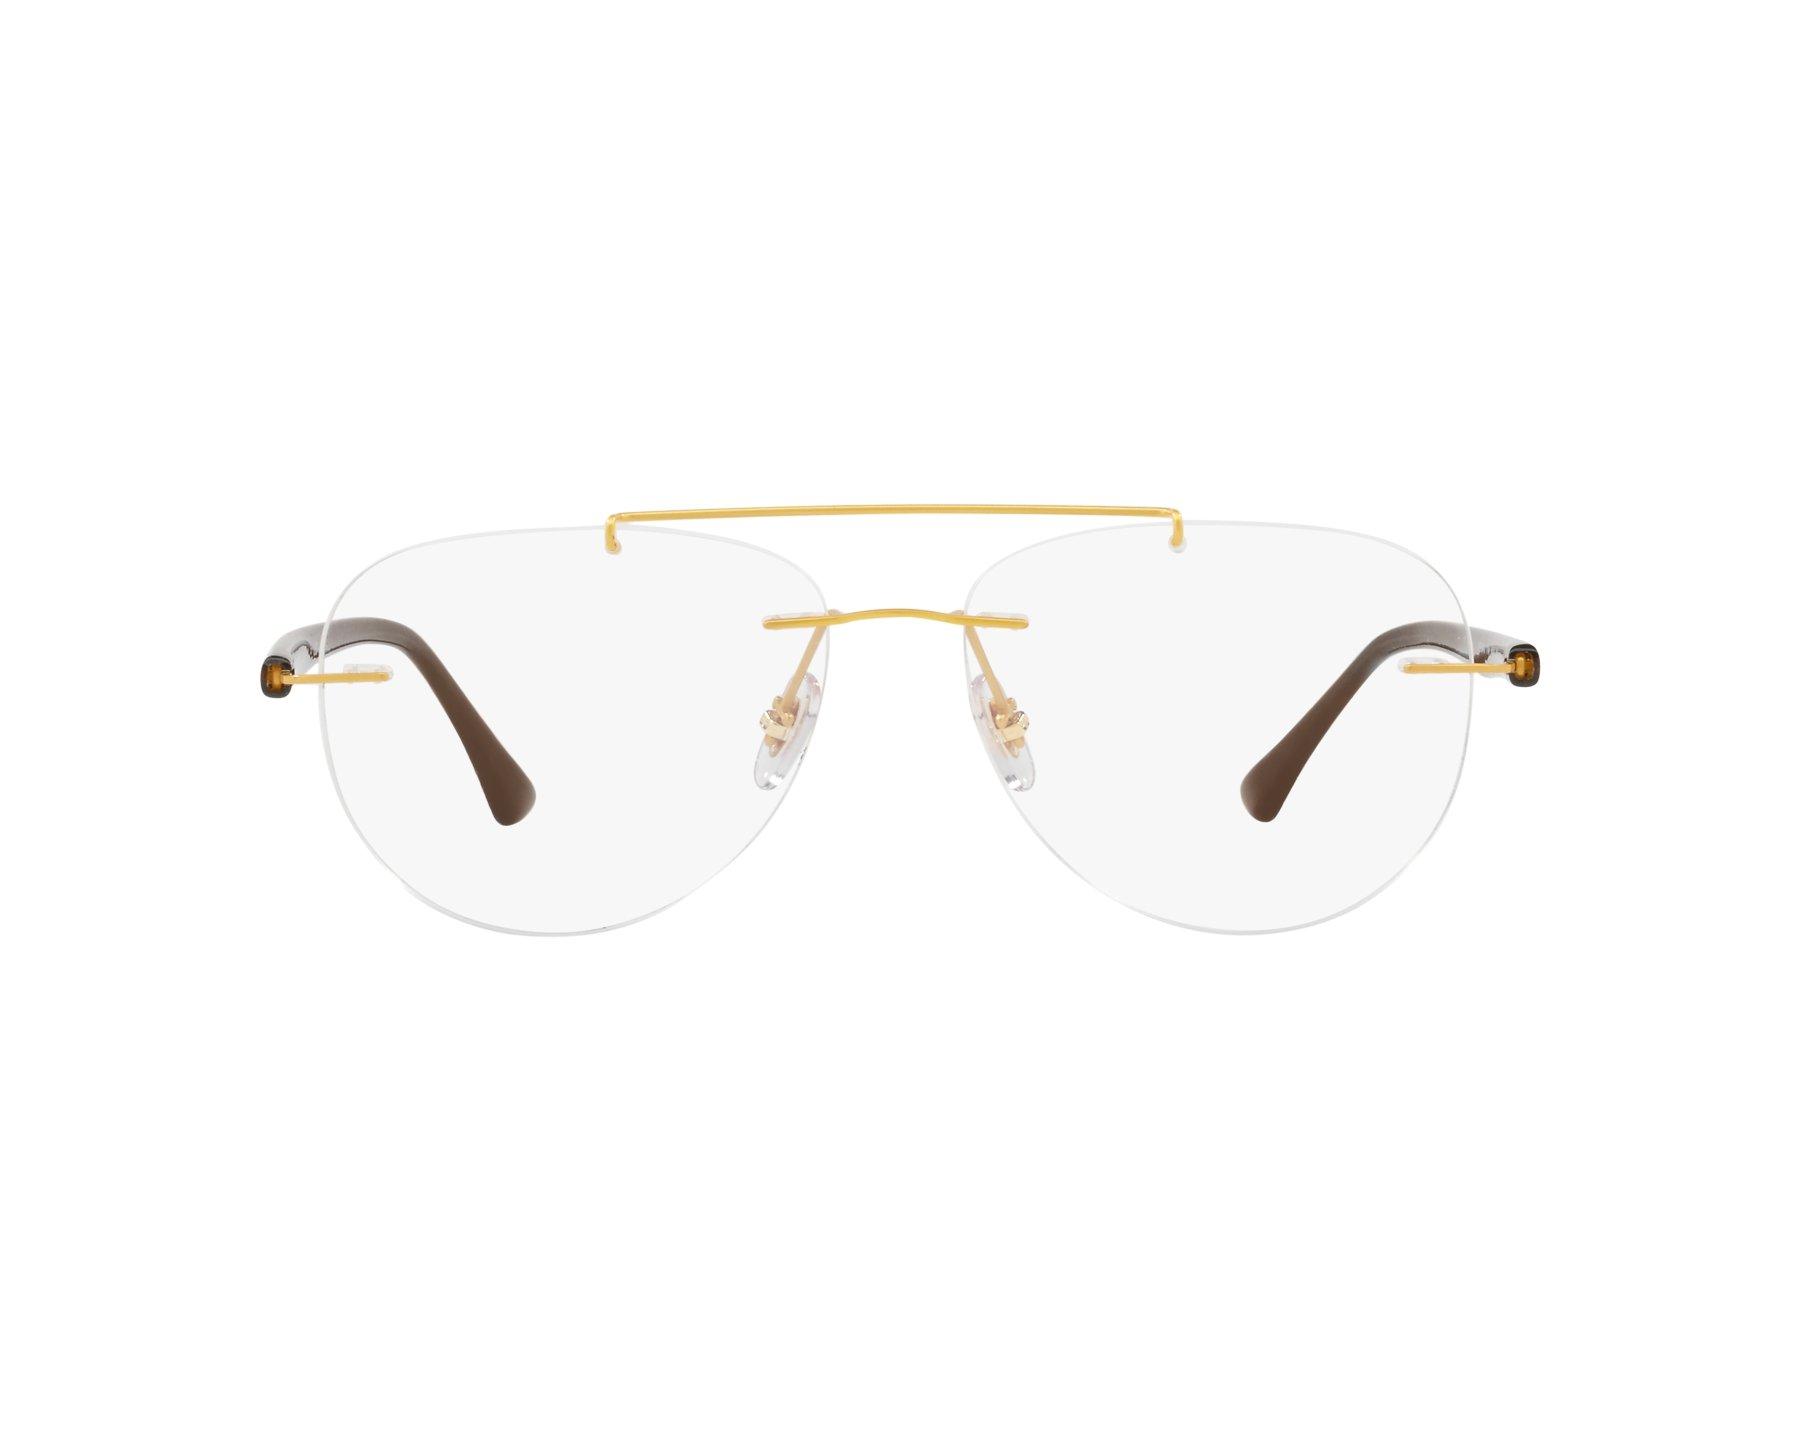 63337ecb91 eyeglasses Ray-Ban RX-8749 1194 - Gold Brown 360 degree view 1